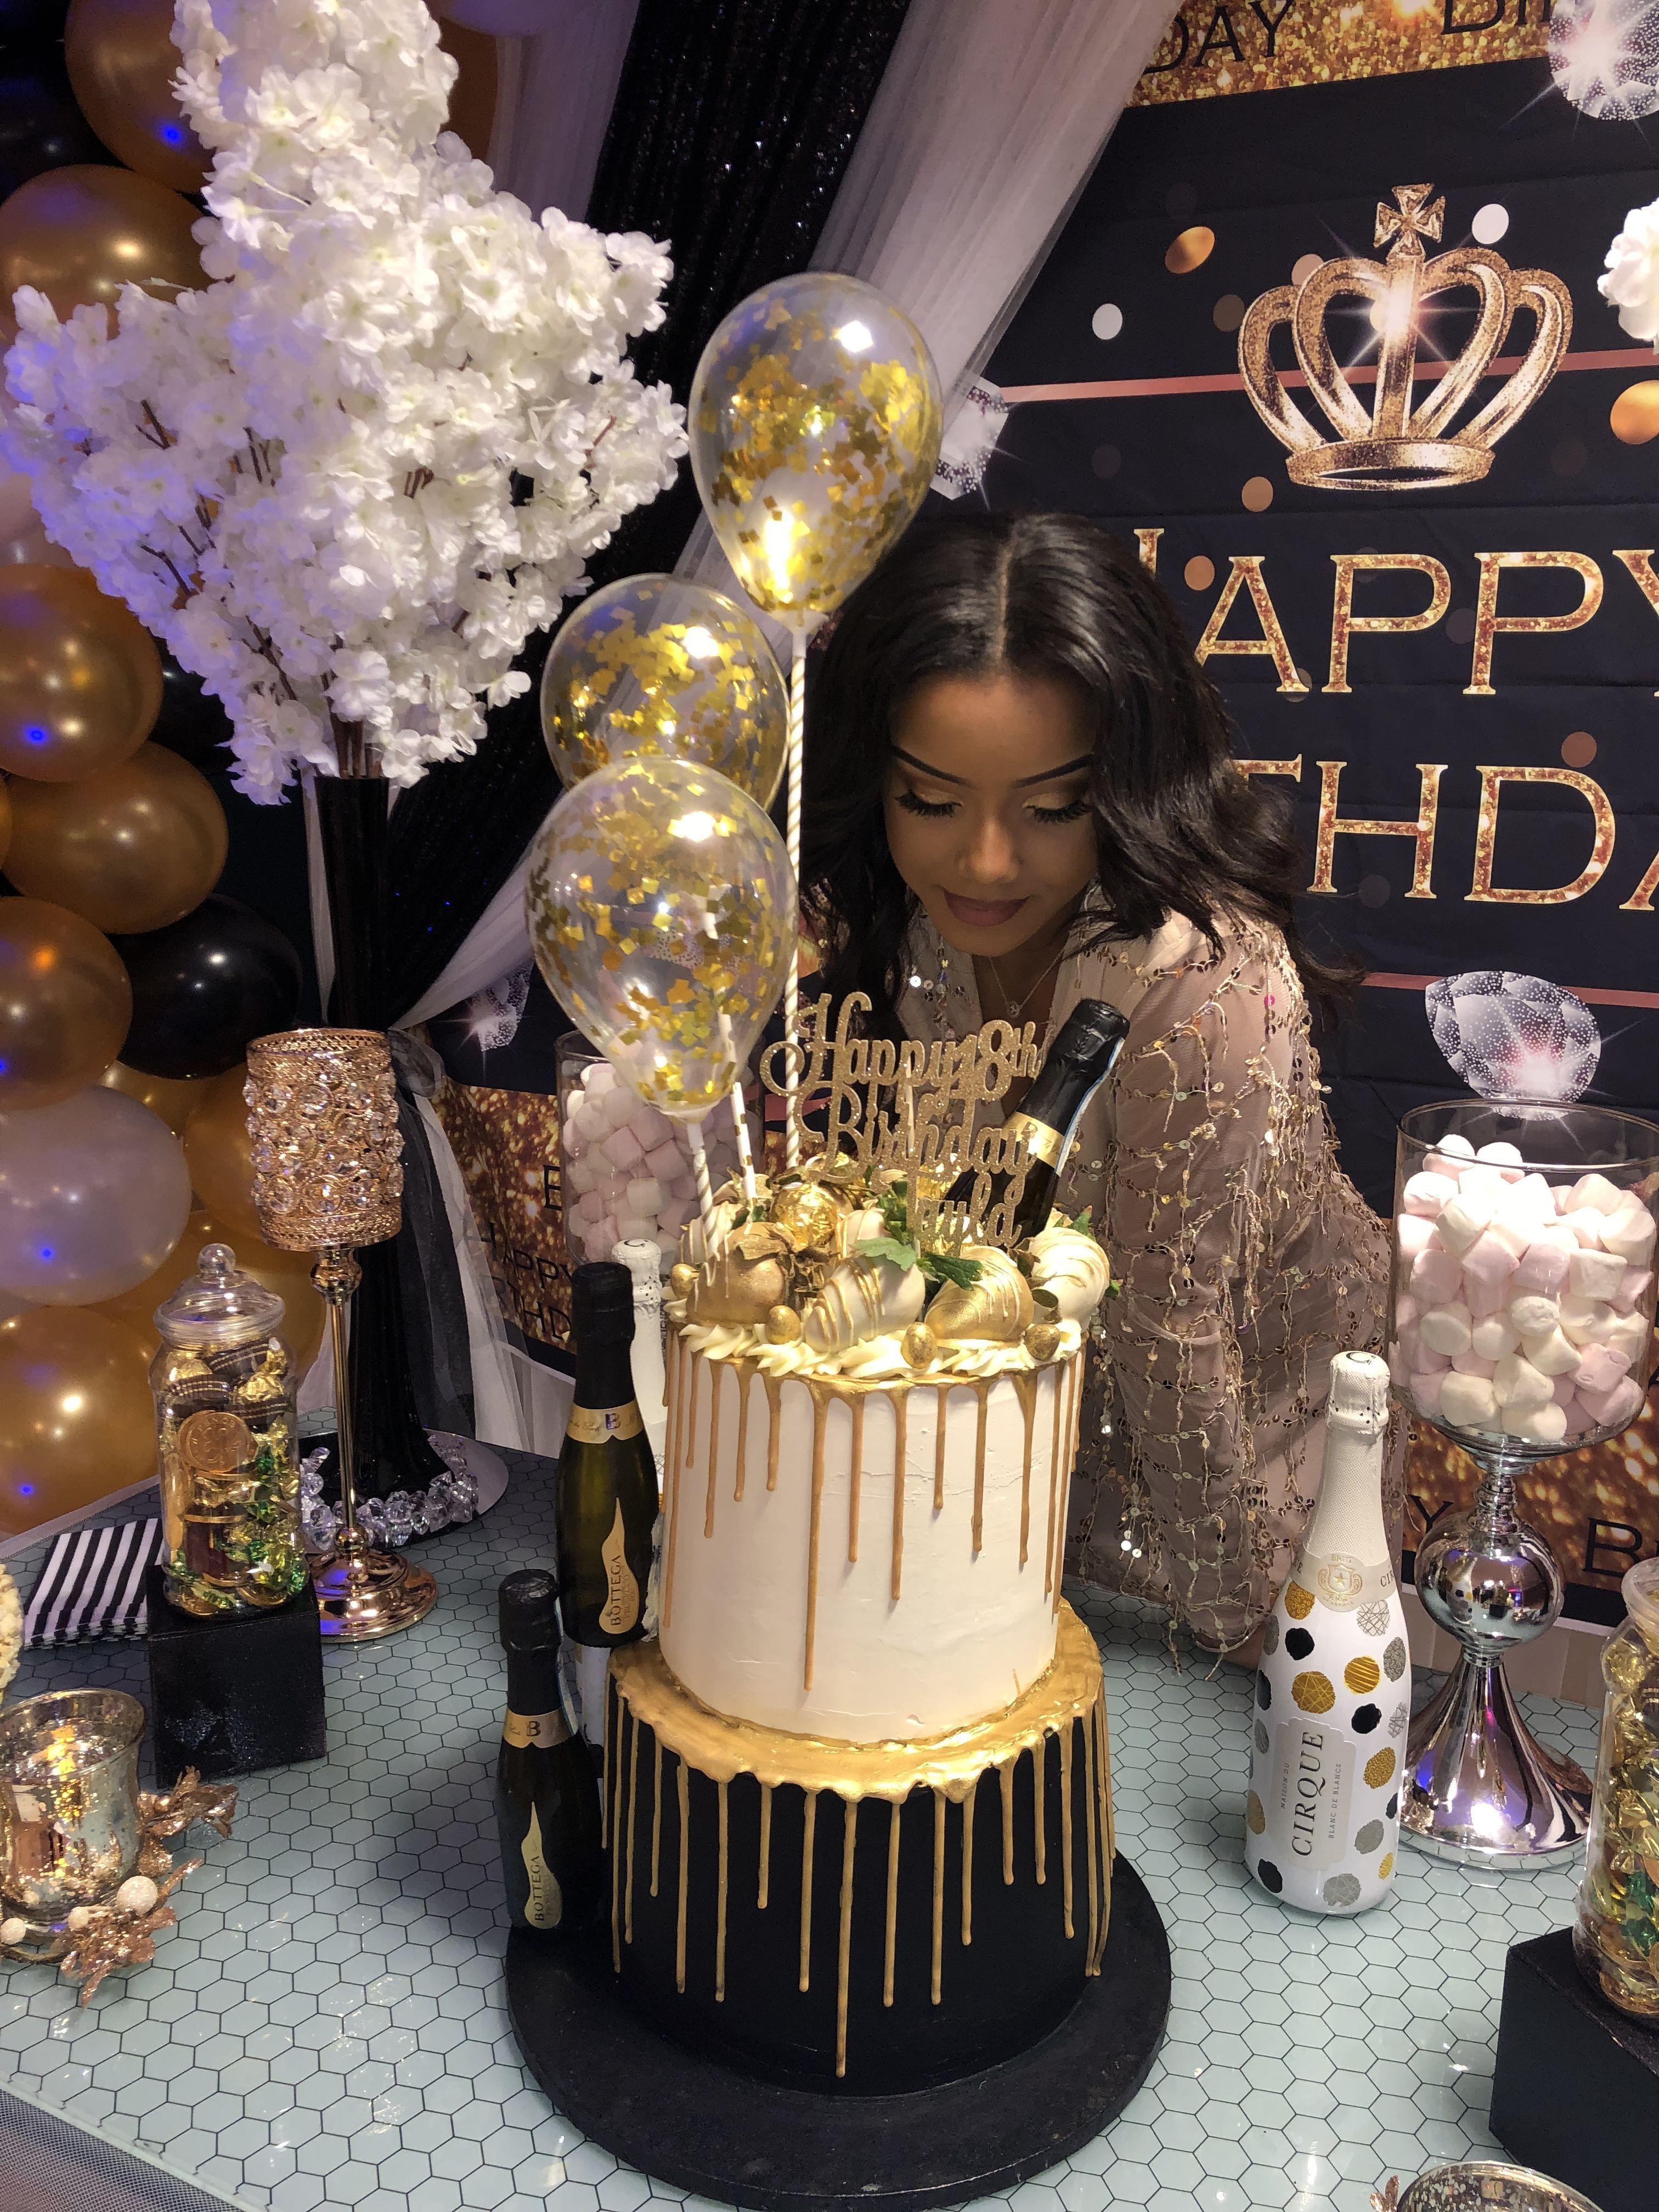 Black White Prosecco Balloon Cake 21stbirthdaydecorations 21st Birthday Cakes 18th Birthday Party Beautiful Birthday Cakes